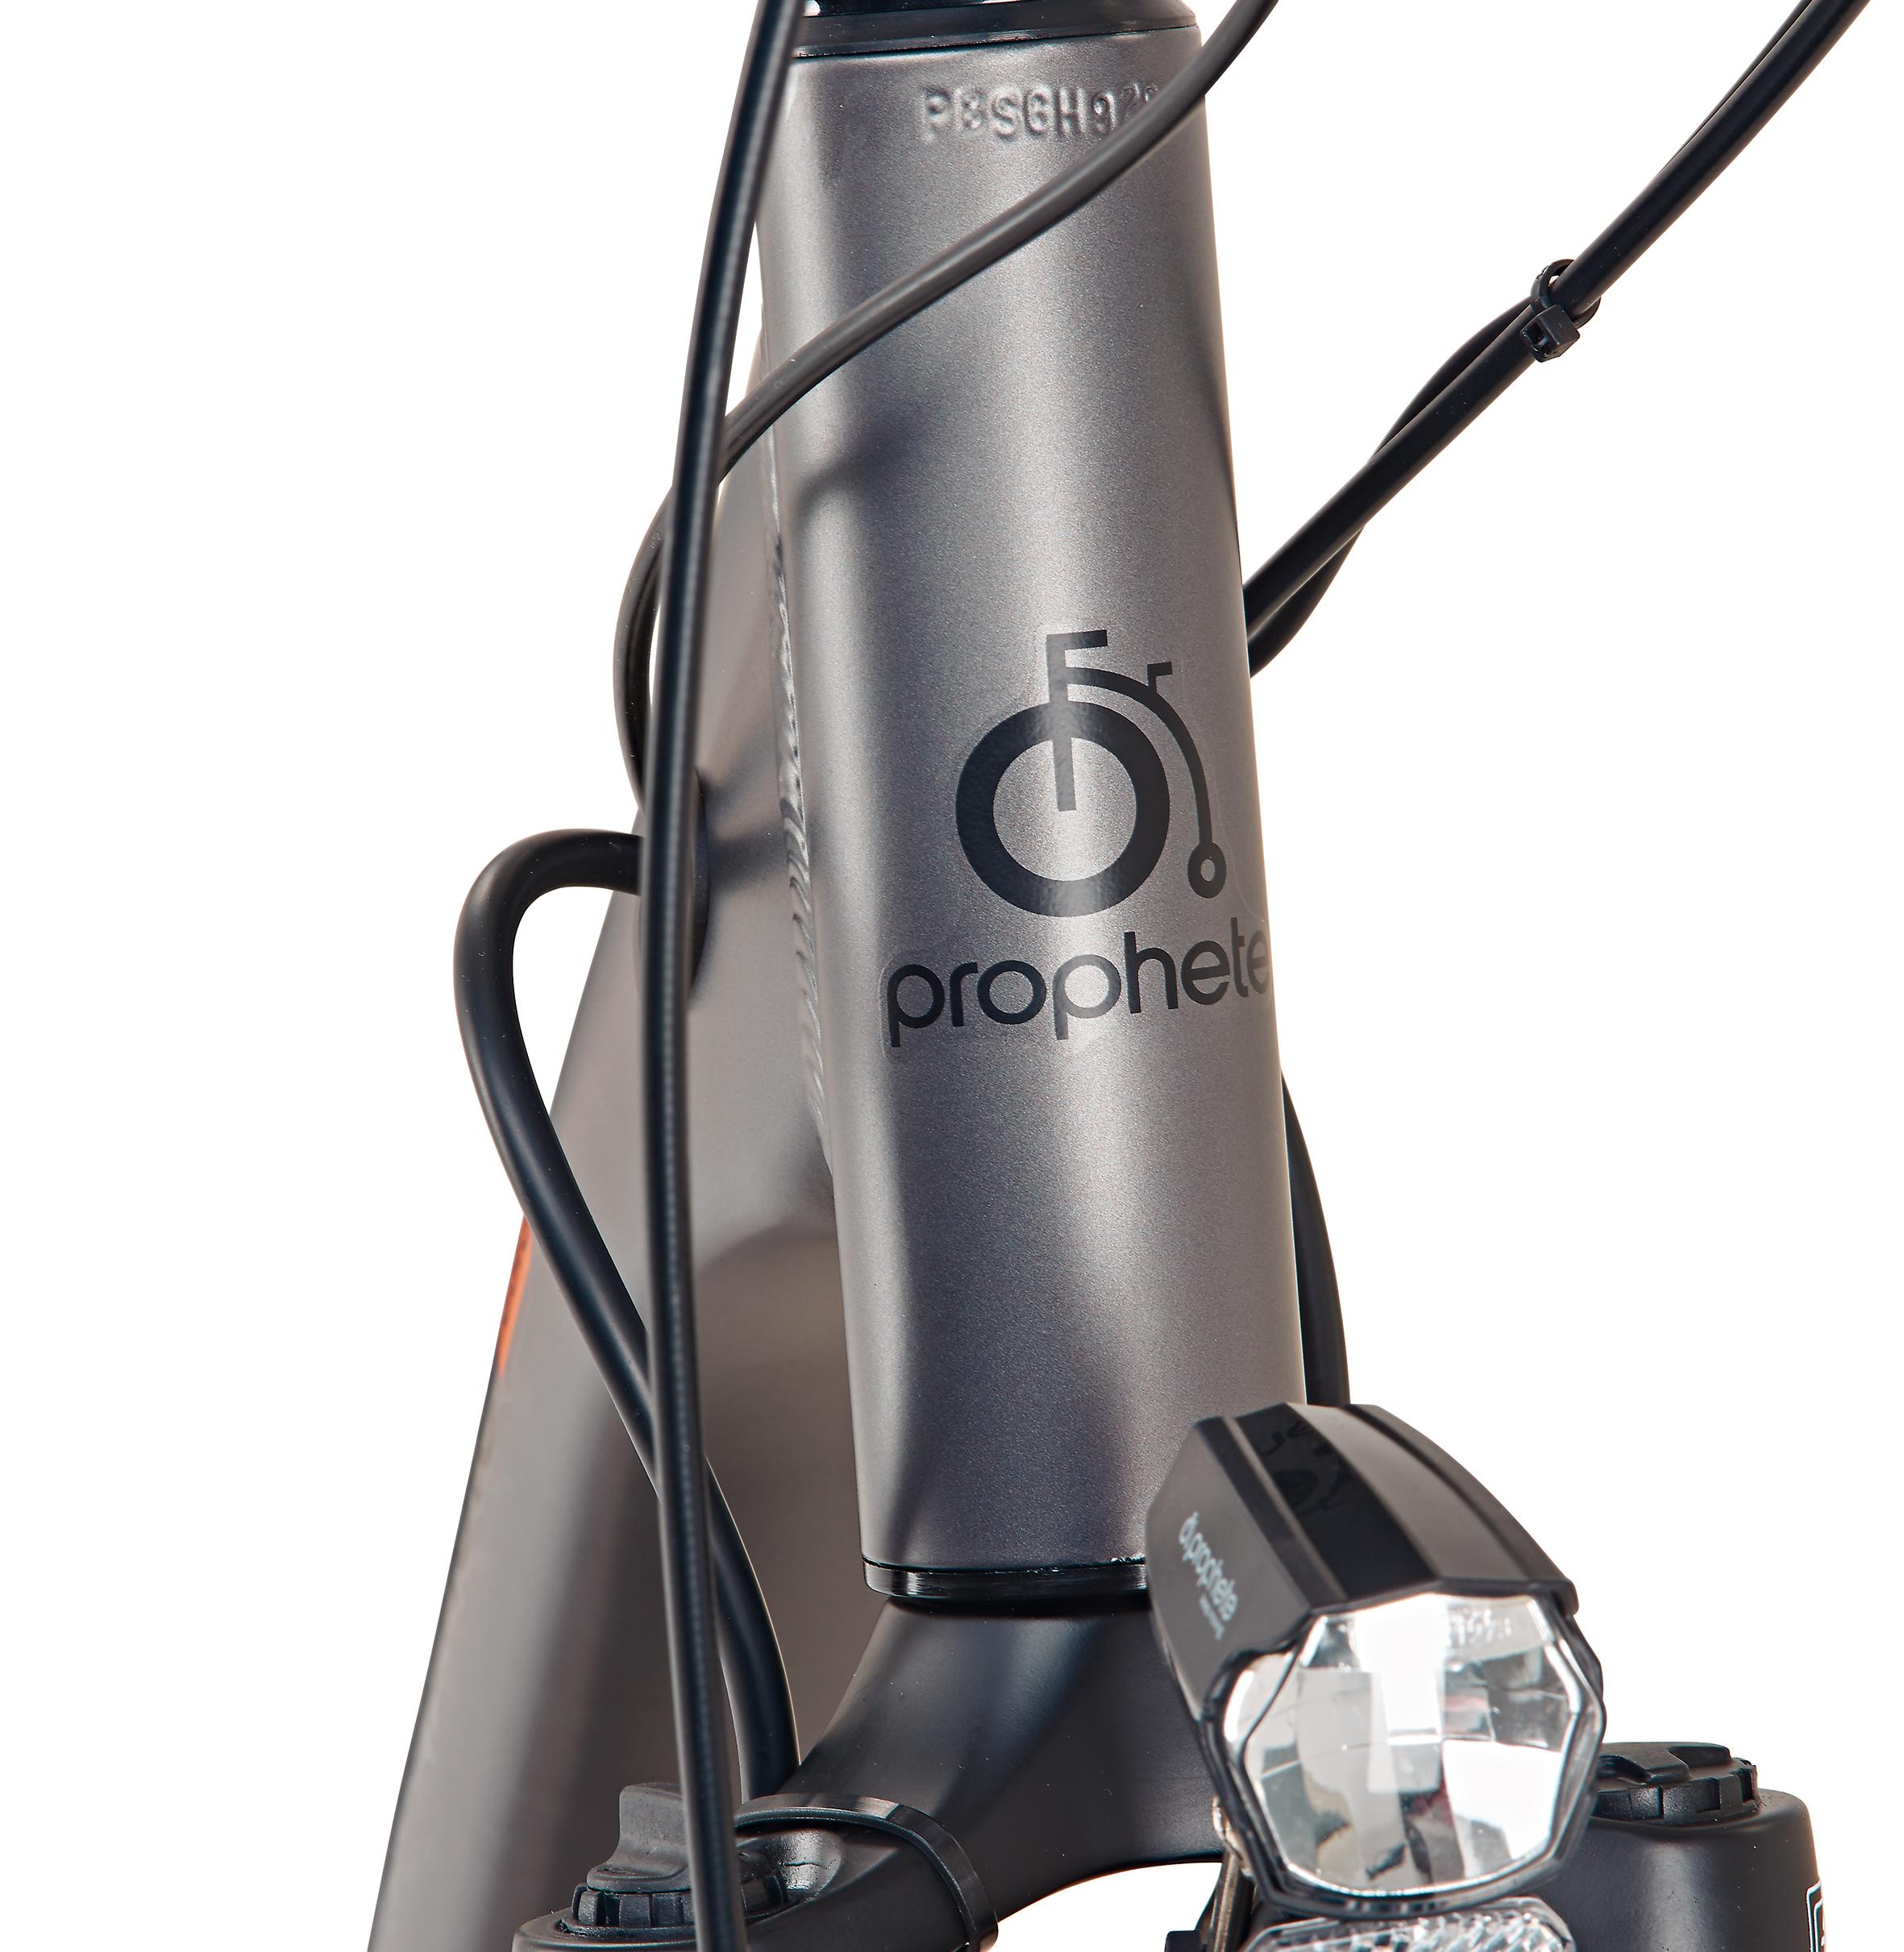 "Prophete Elektrofahrrad / E-Bike Geniesser e9.5 City E-Bike 26"" grau Bild 3"